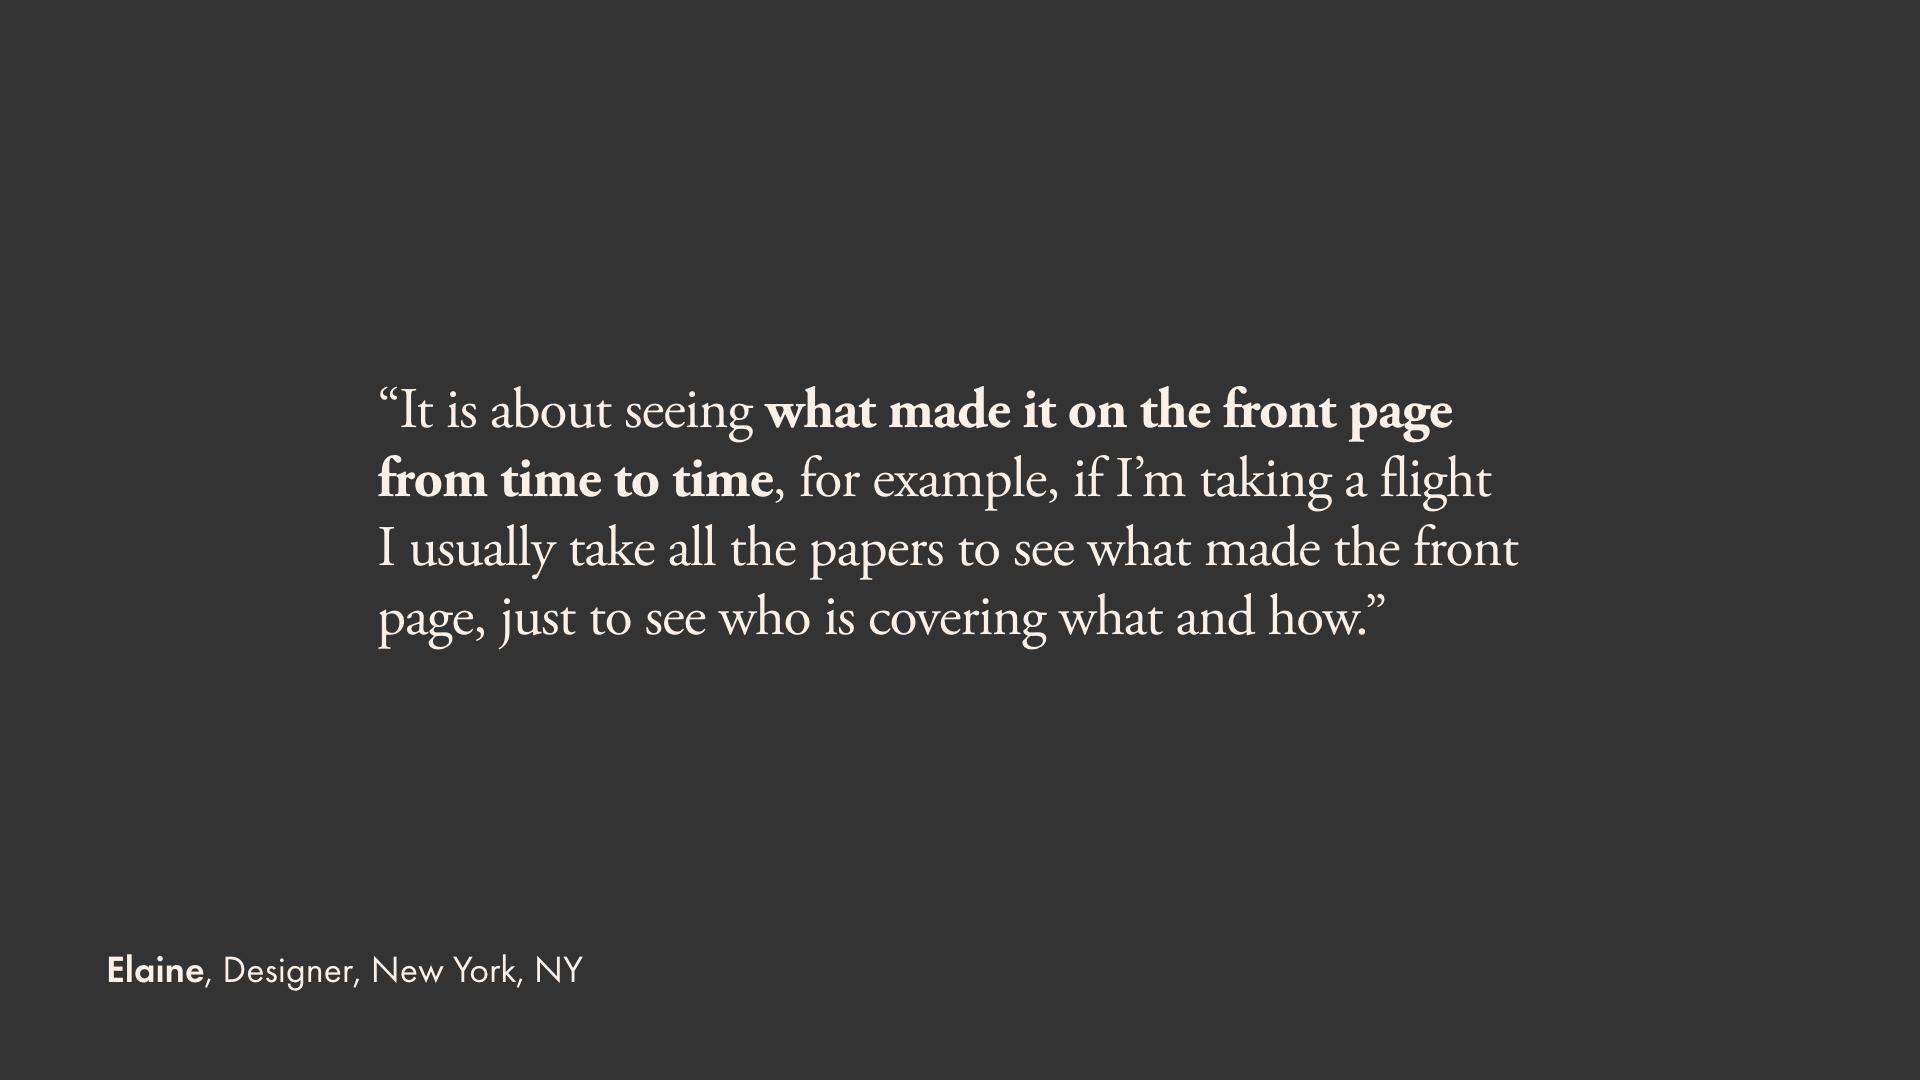 NYT_Create_portfolio_new.002.jpeg